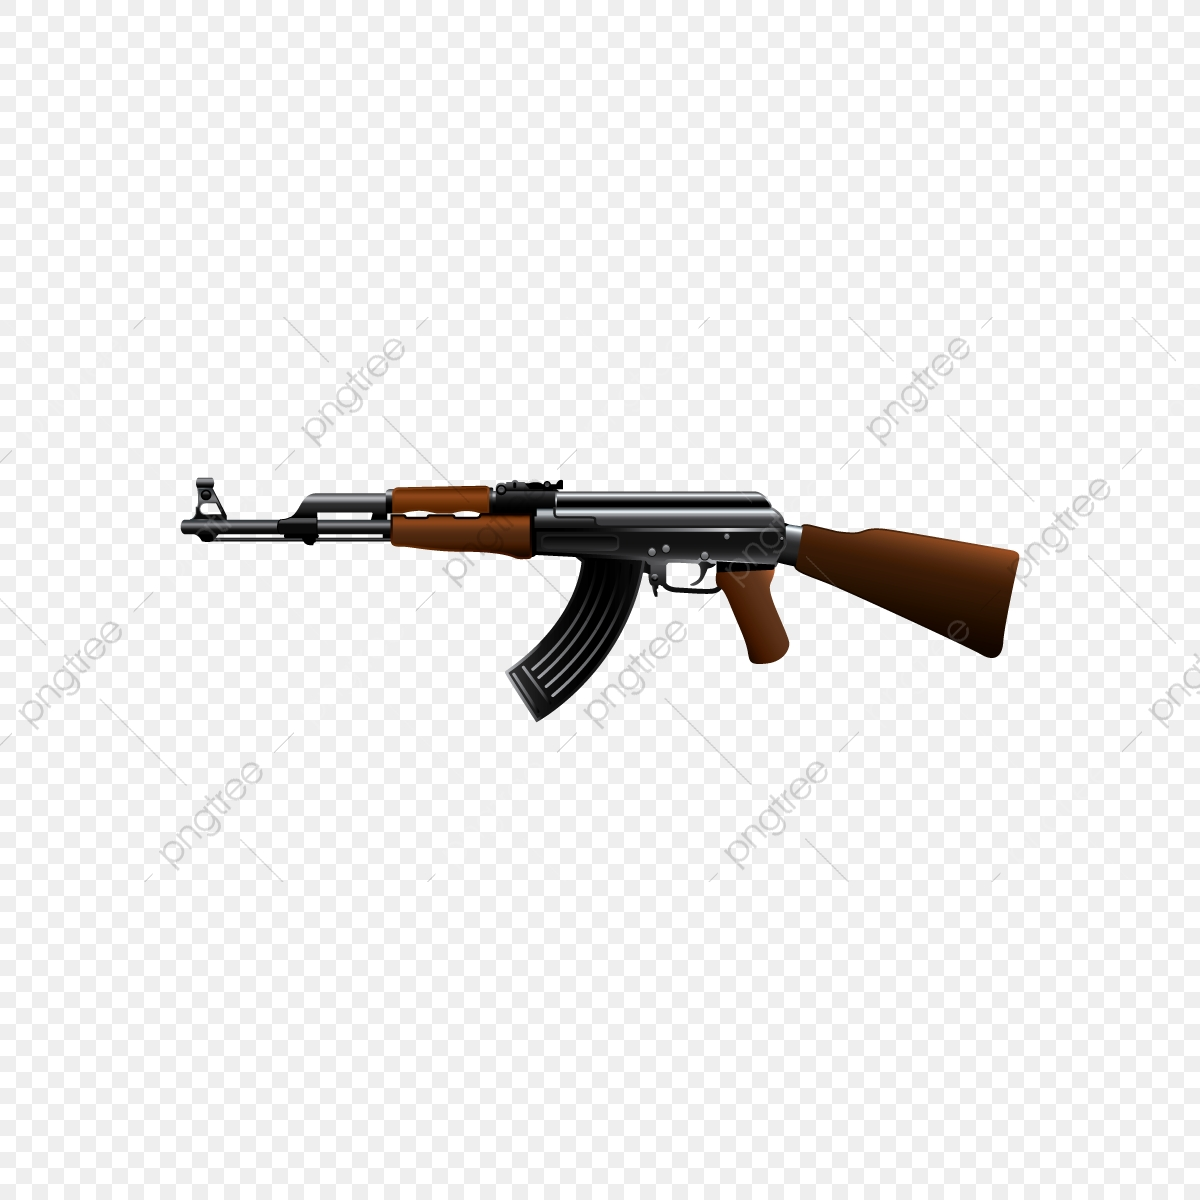 Ak47 Guns, Ak47, 47, Gun PNG Transparent Clipart Image and PSD File.